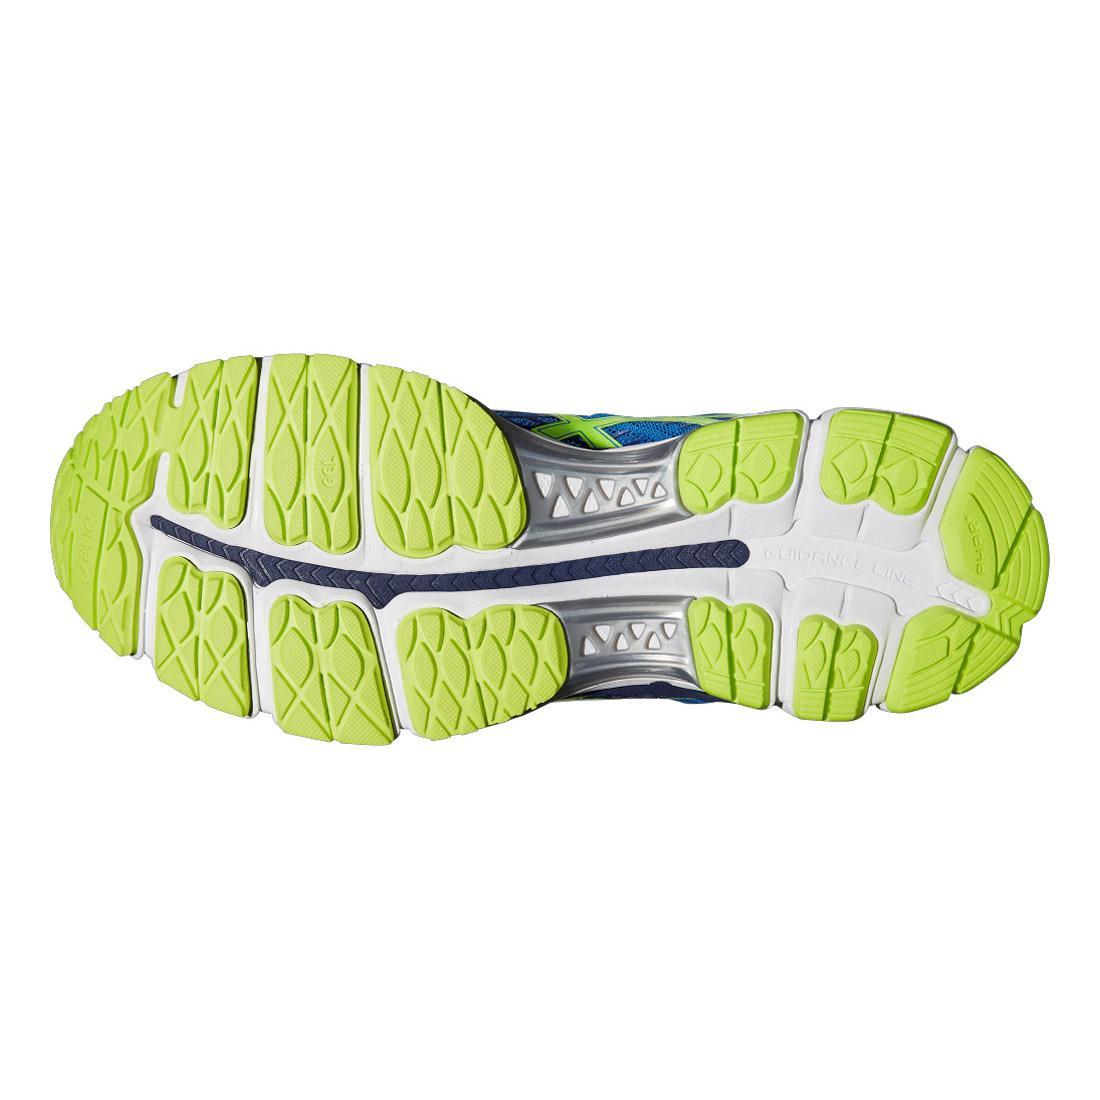 Asics Mens GEL Yellow Nimbus 17/ Chaussures de course GEL Electric Blue/ Flash Yellow 6c2ad8f - newboost.website